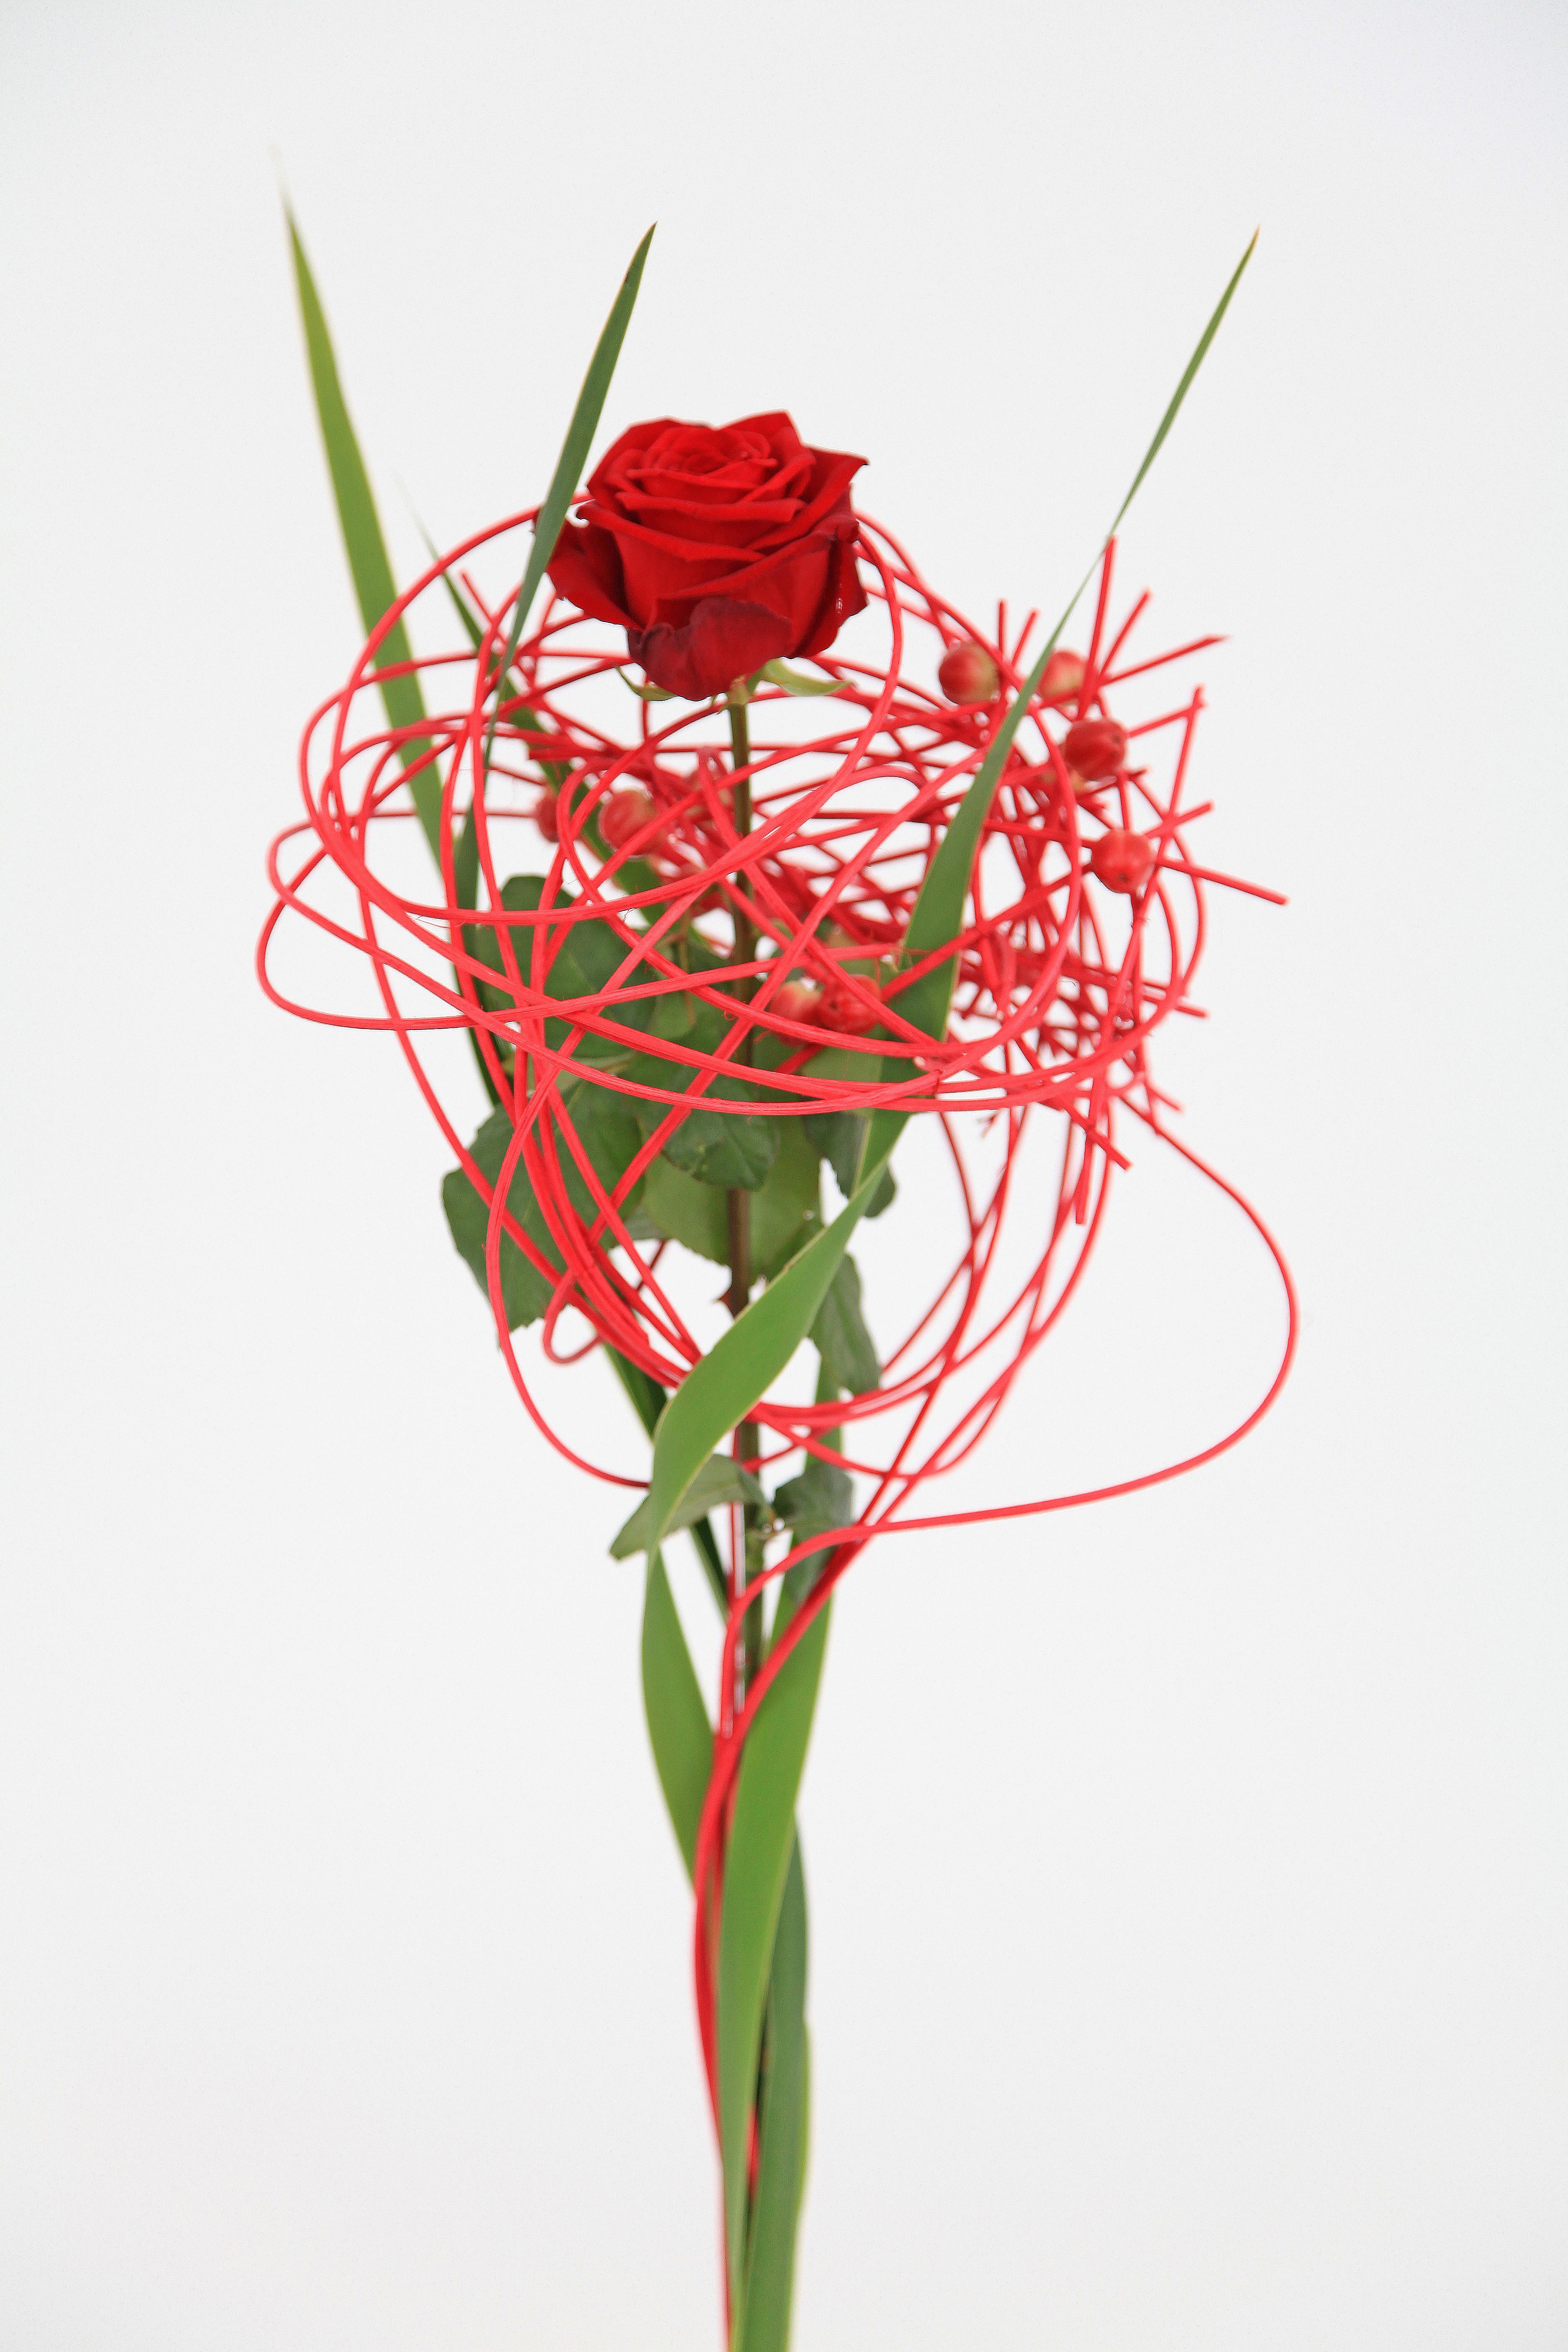 Issue 7 of Floral fundamentals magazine porta nova